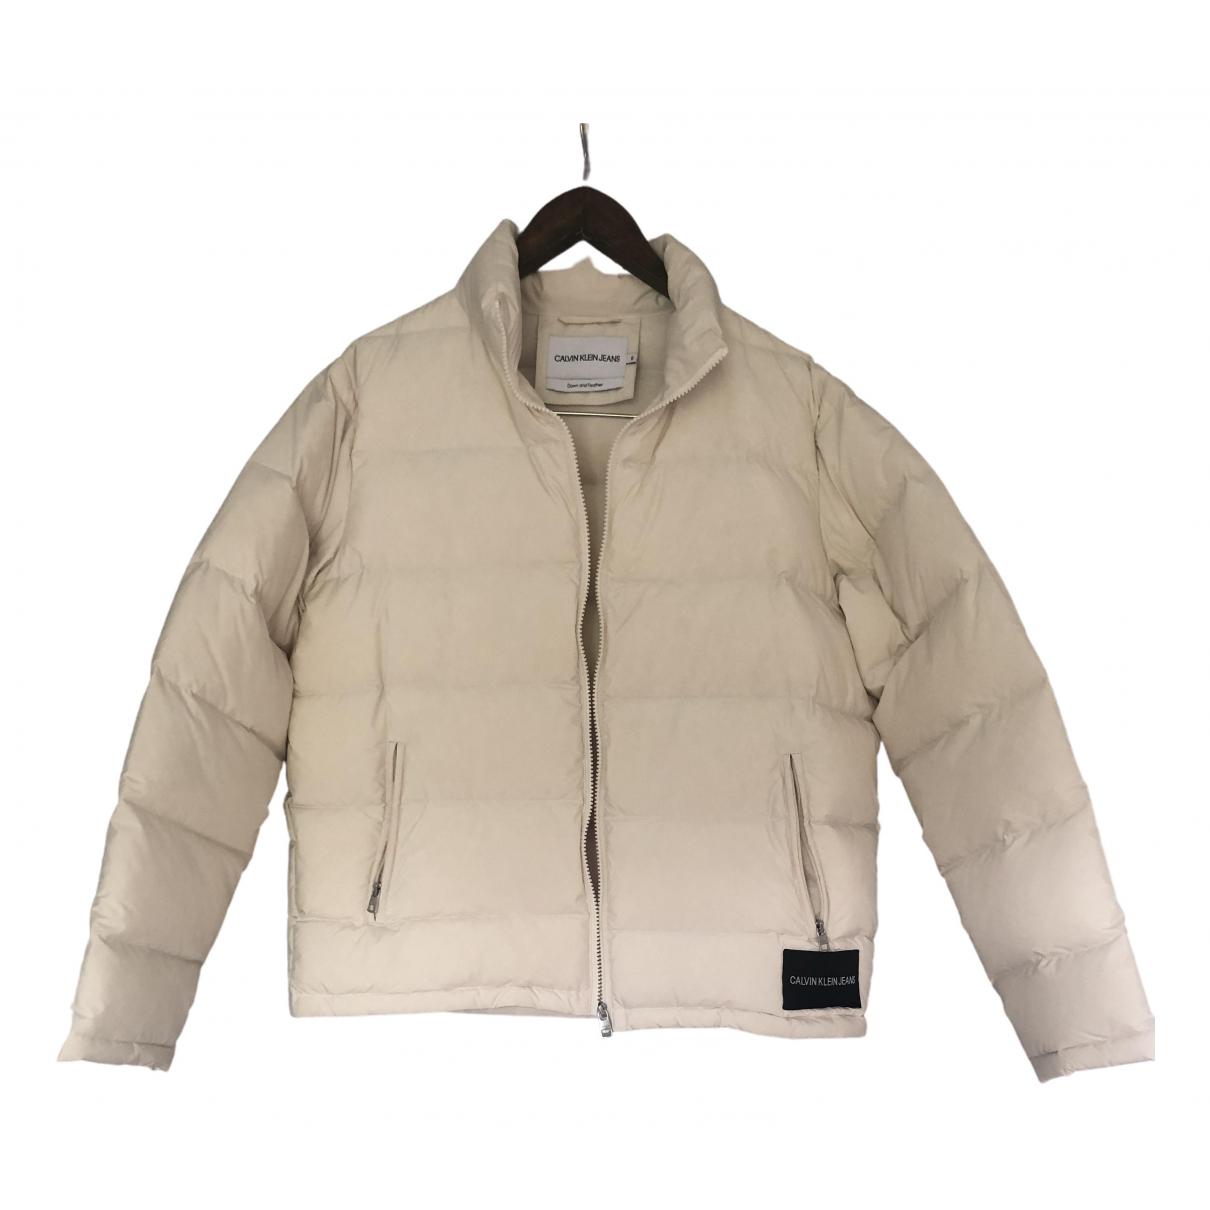 Calvin Klein \N Beige coat for Women S International